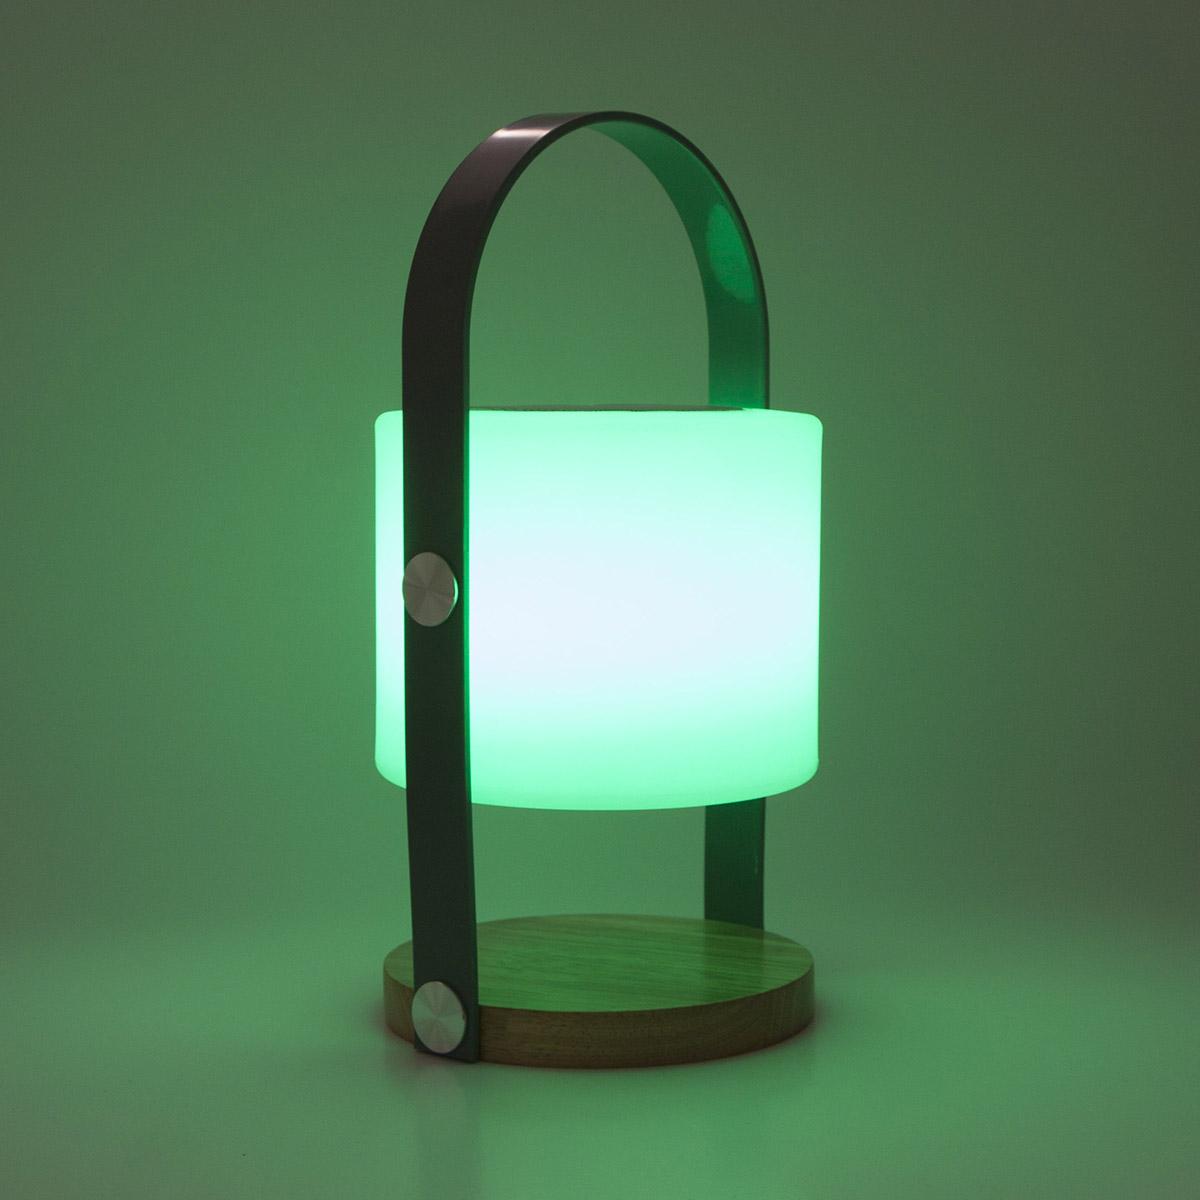 Lampe nomade avec enceinte en polyéthylène blanc